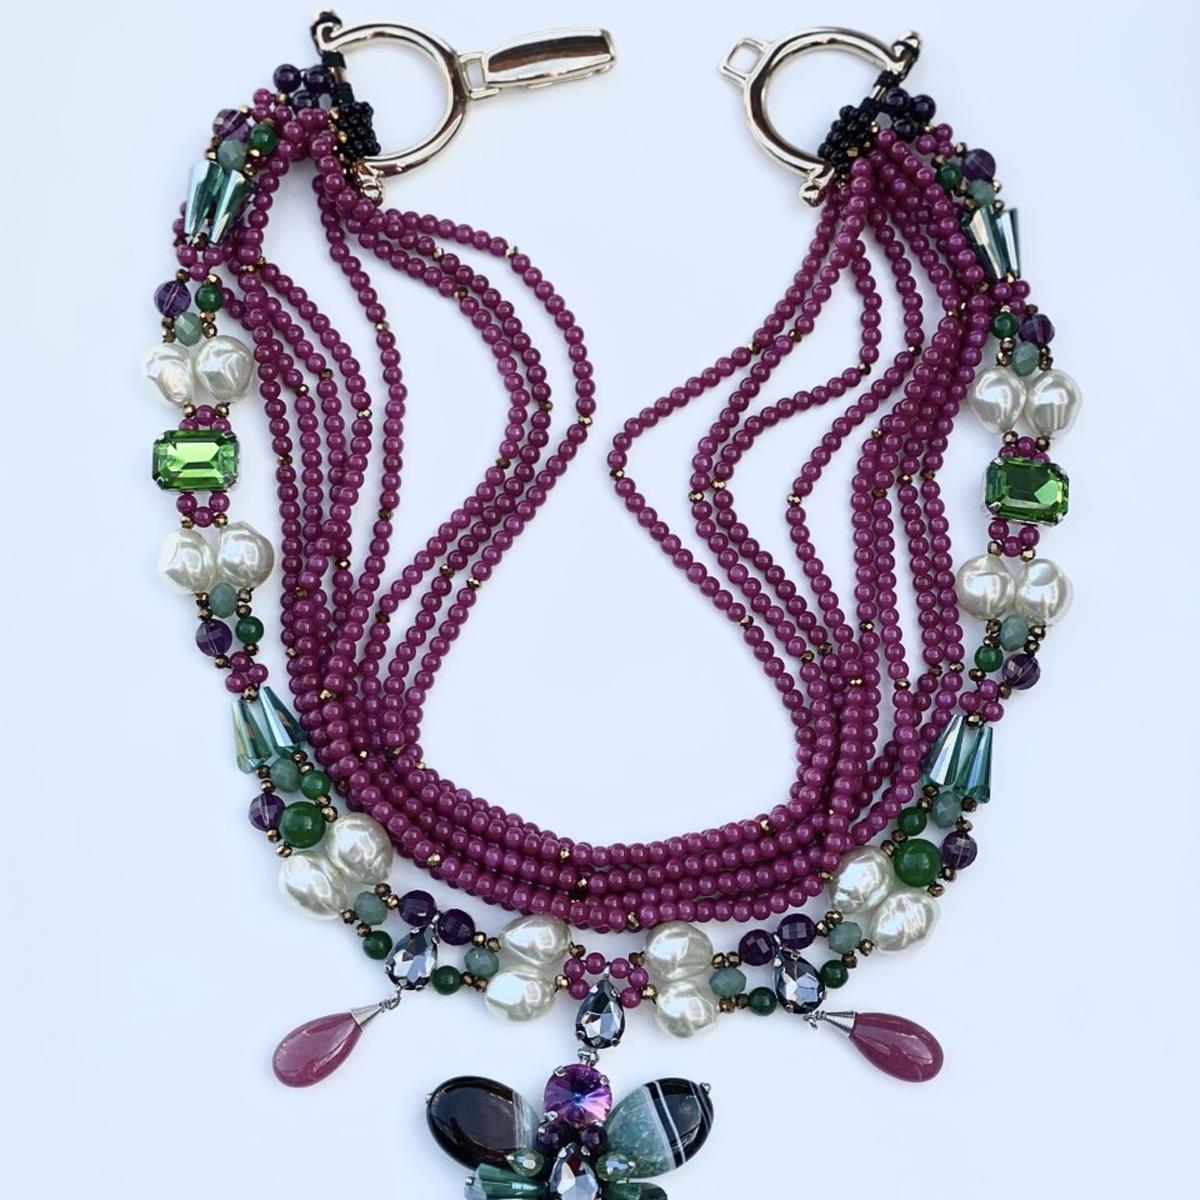 Beaded Flower Necklace In Fuchsia